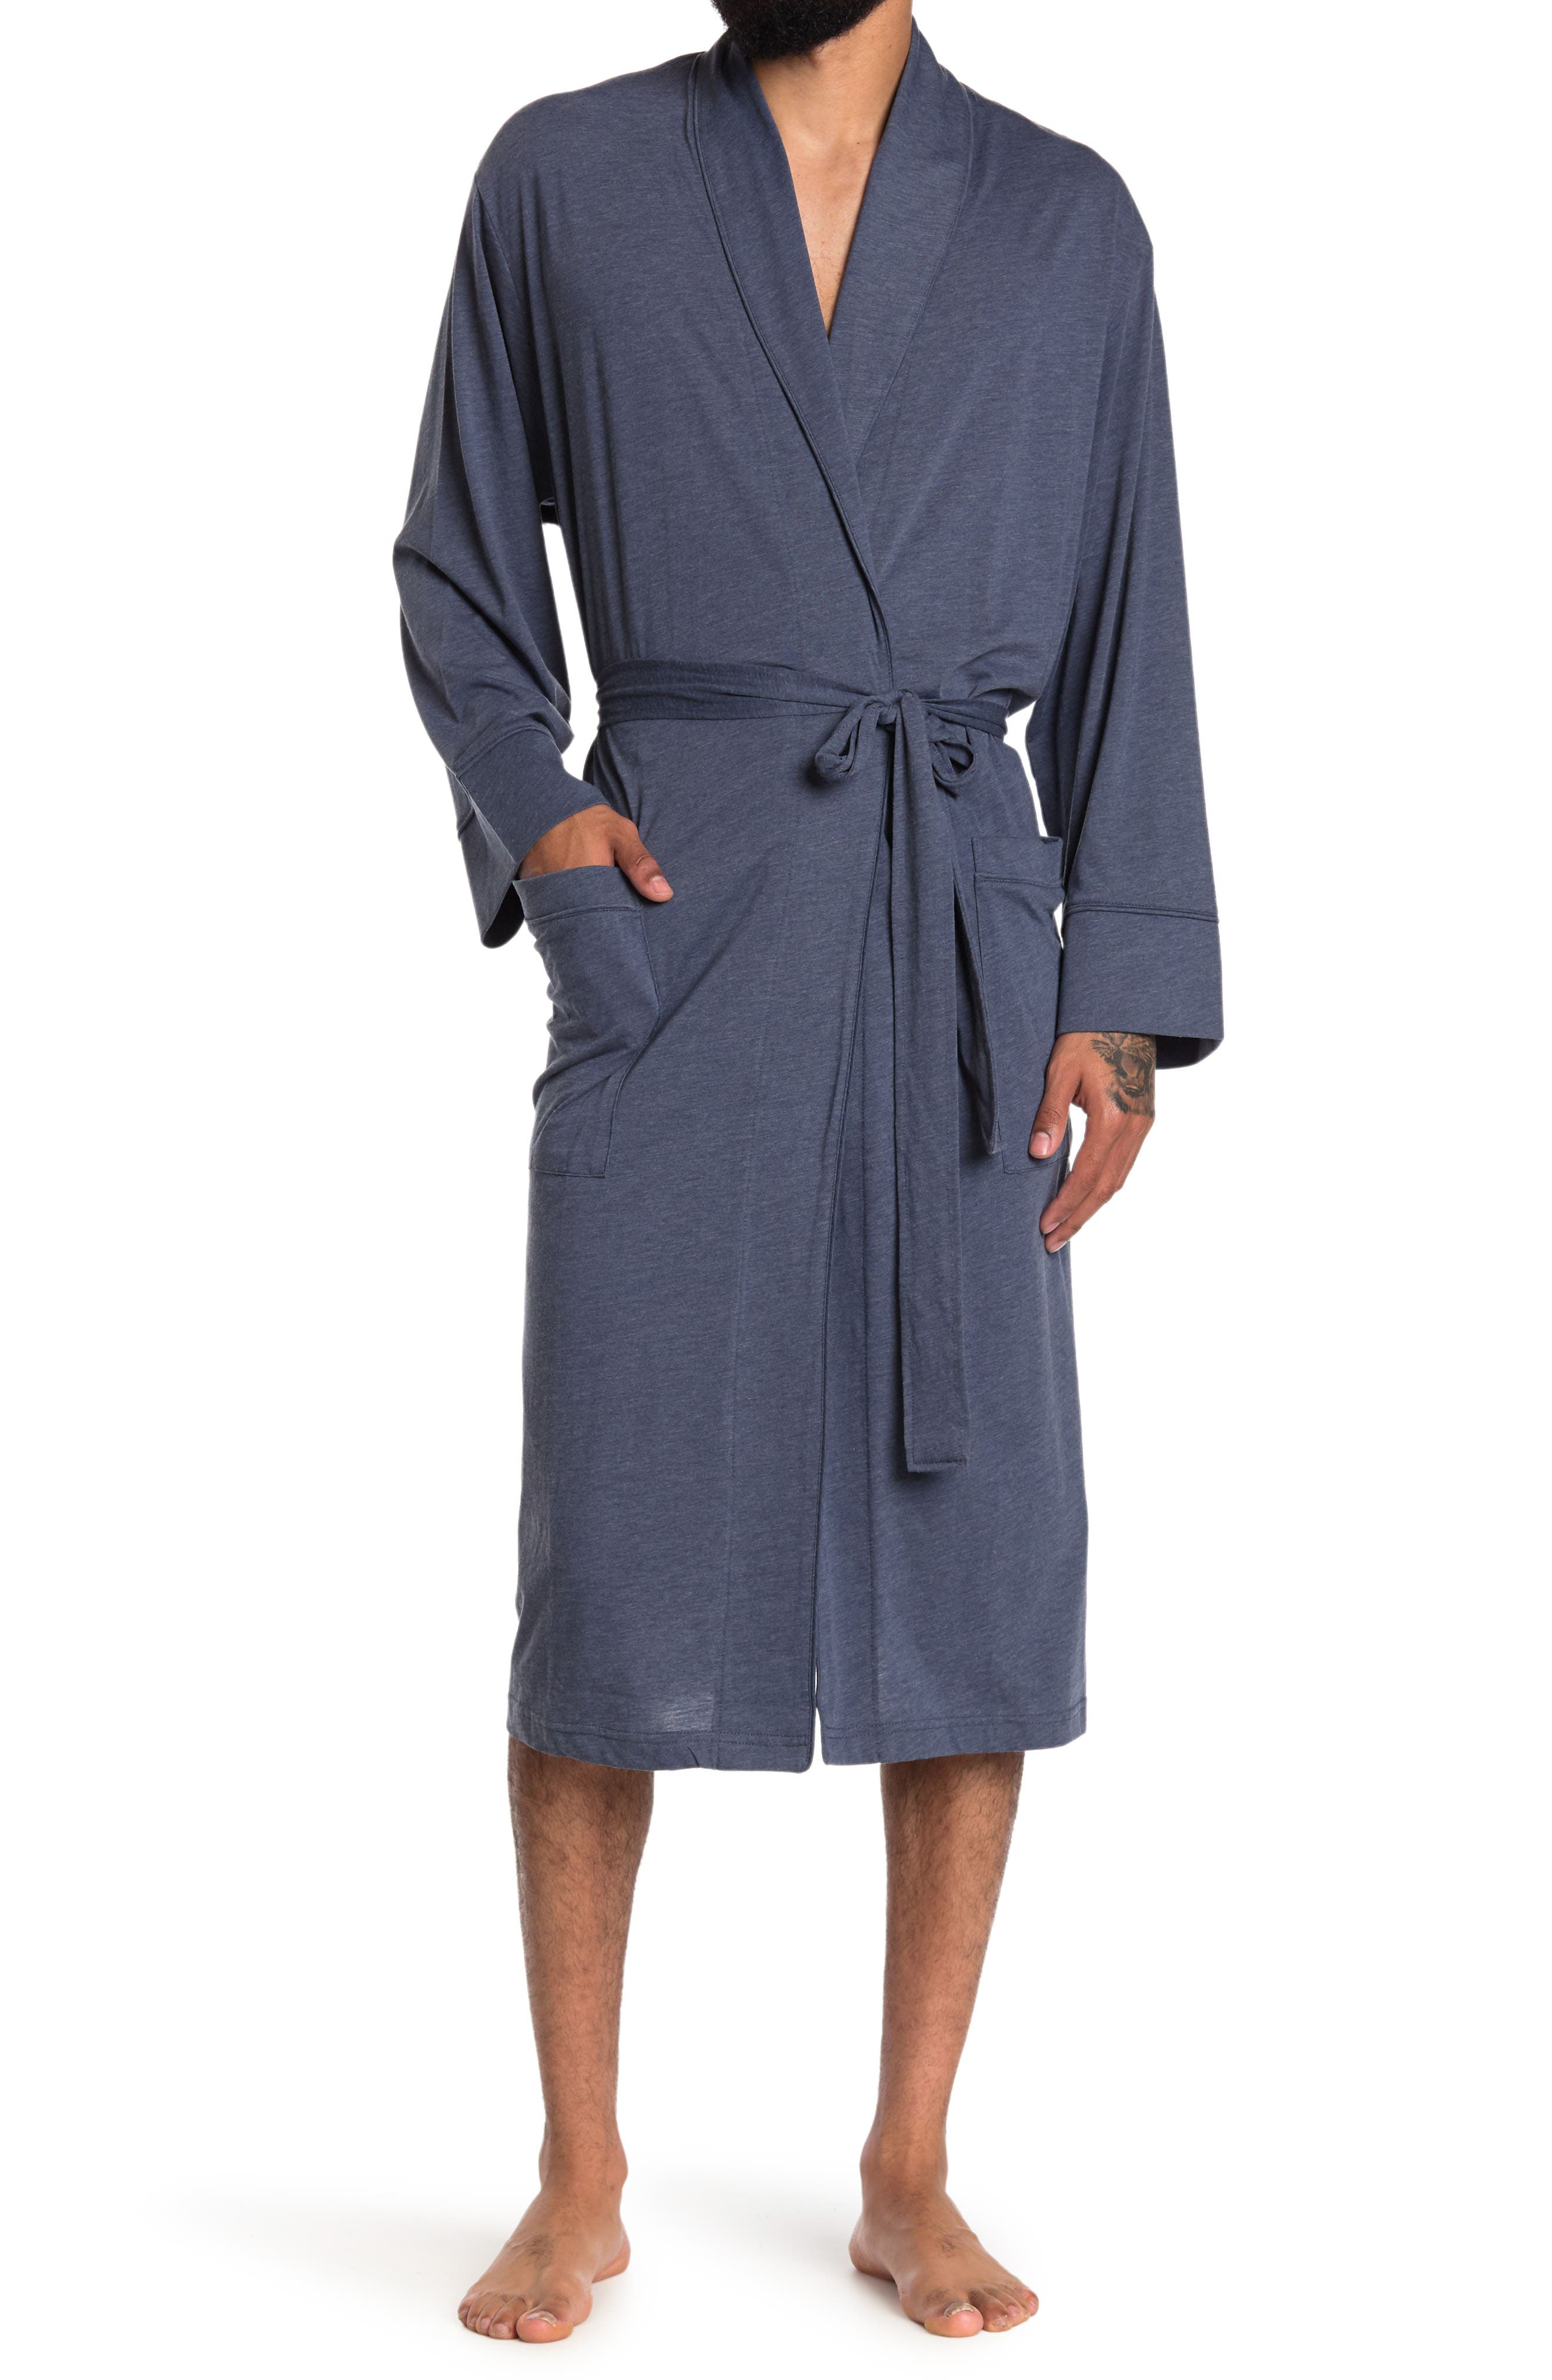 Image of Daniel Buchler Heathered Robe